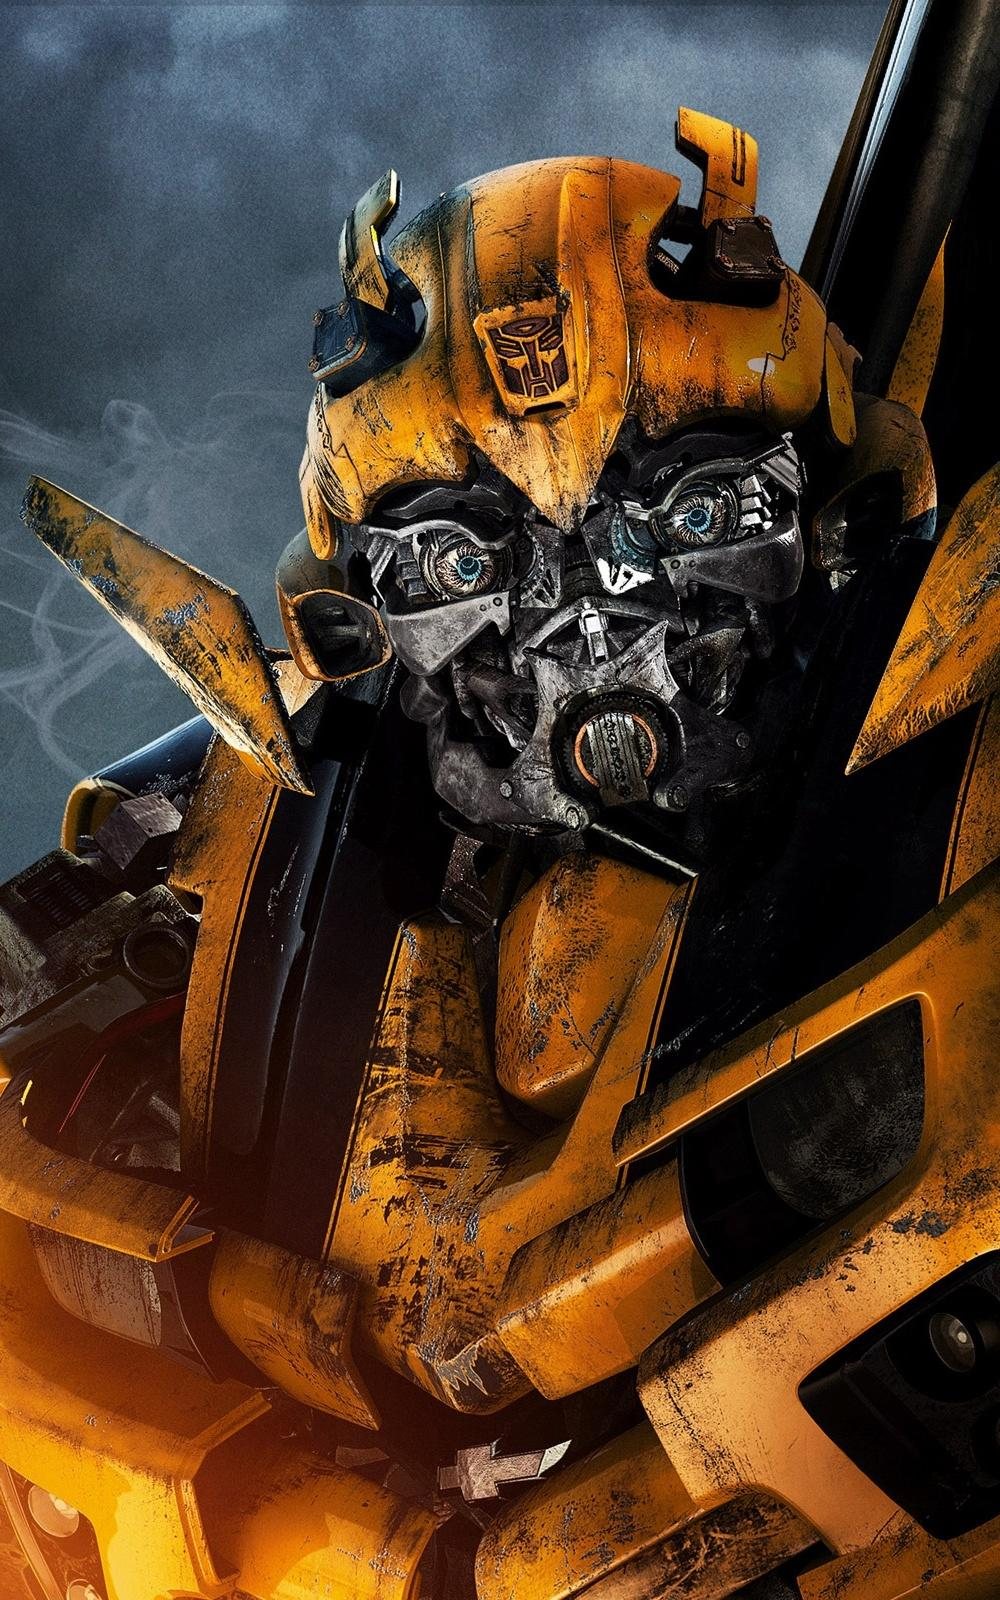 bumblebee transformer yellow machine car power machinery engine drive